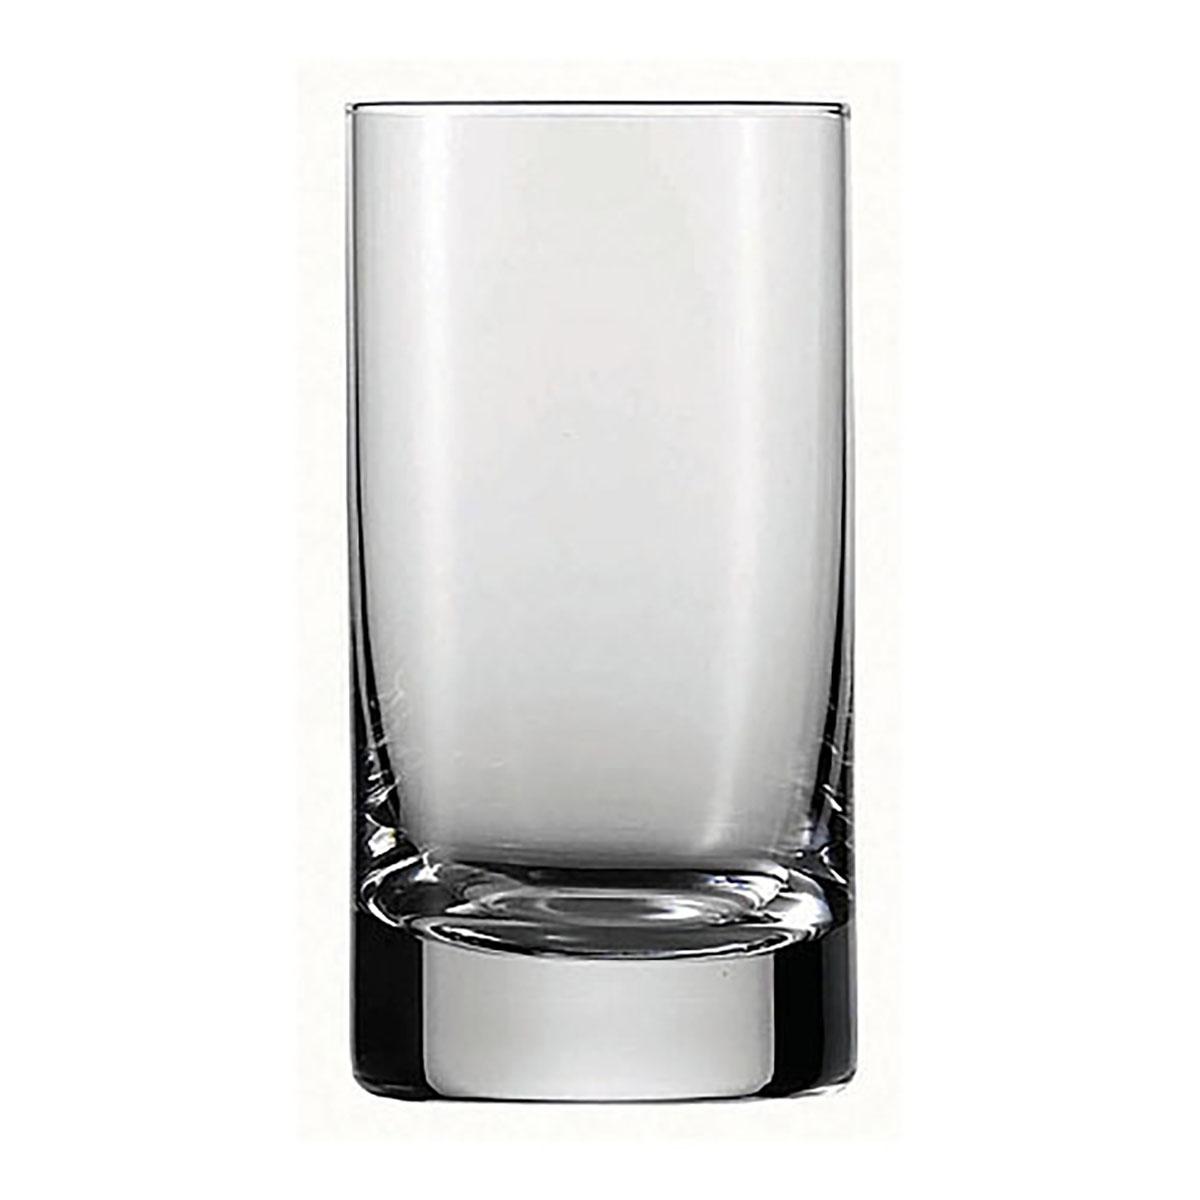 schott zwiesel tritan crystal paris crystal hiball set. Black Bedroom Furniture Sets. Home Design Ideas